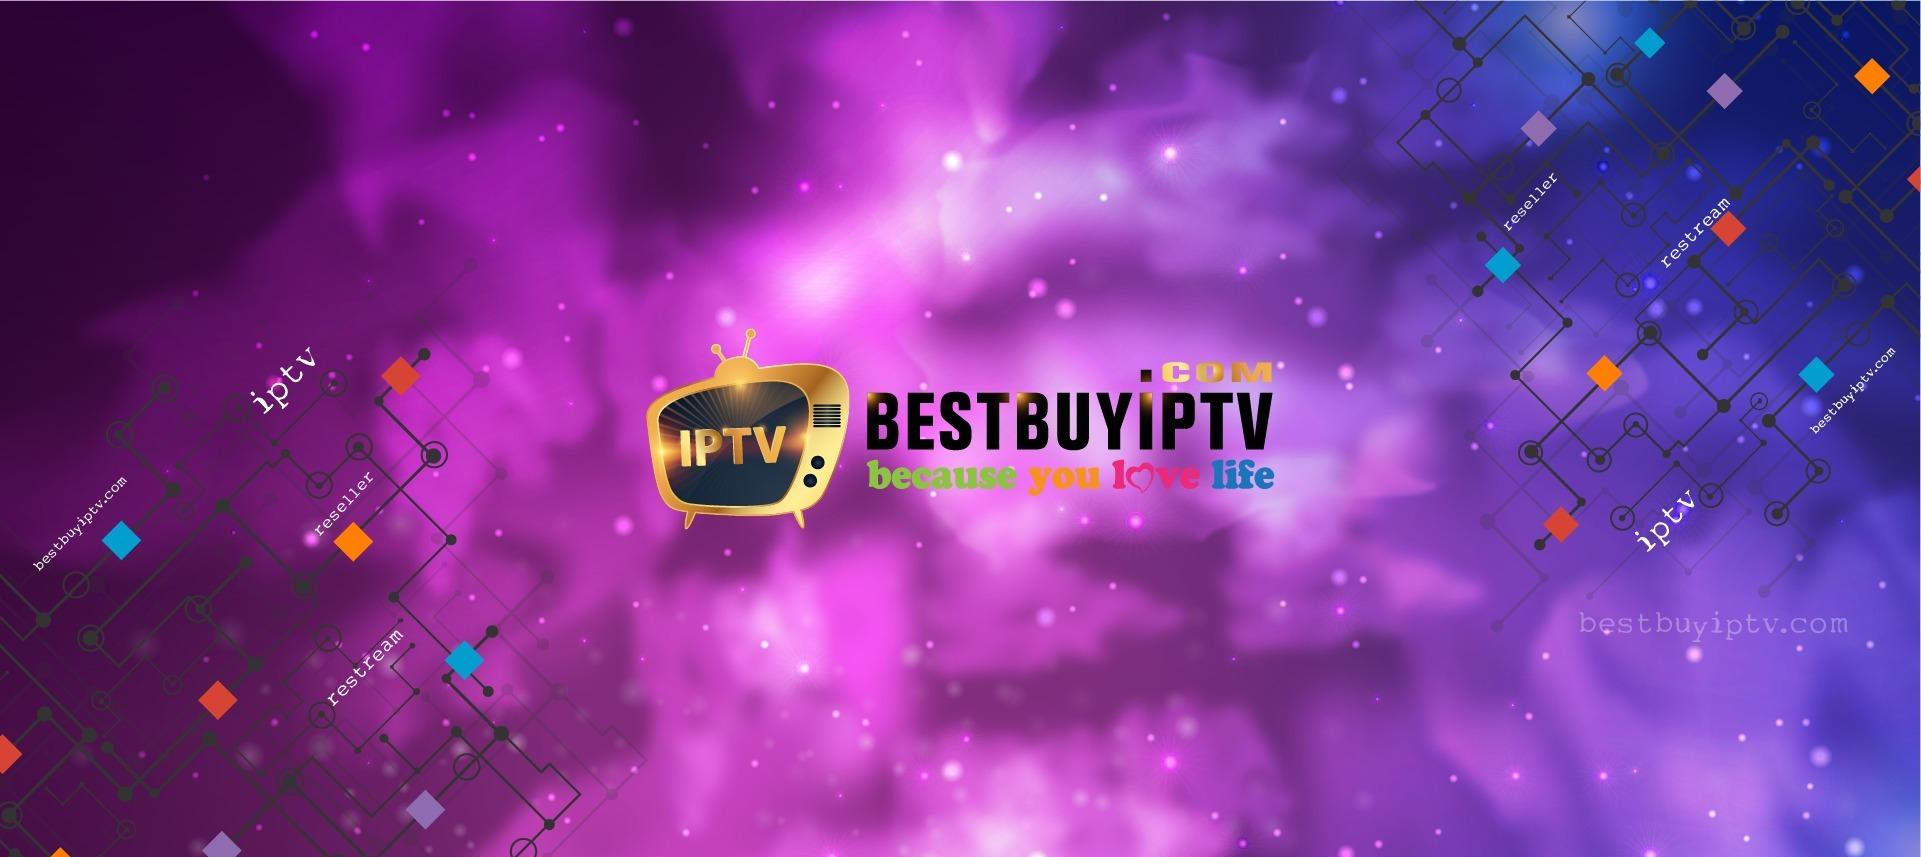 Bestbuy IP (@bestbuyiptv) Cover Image